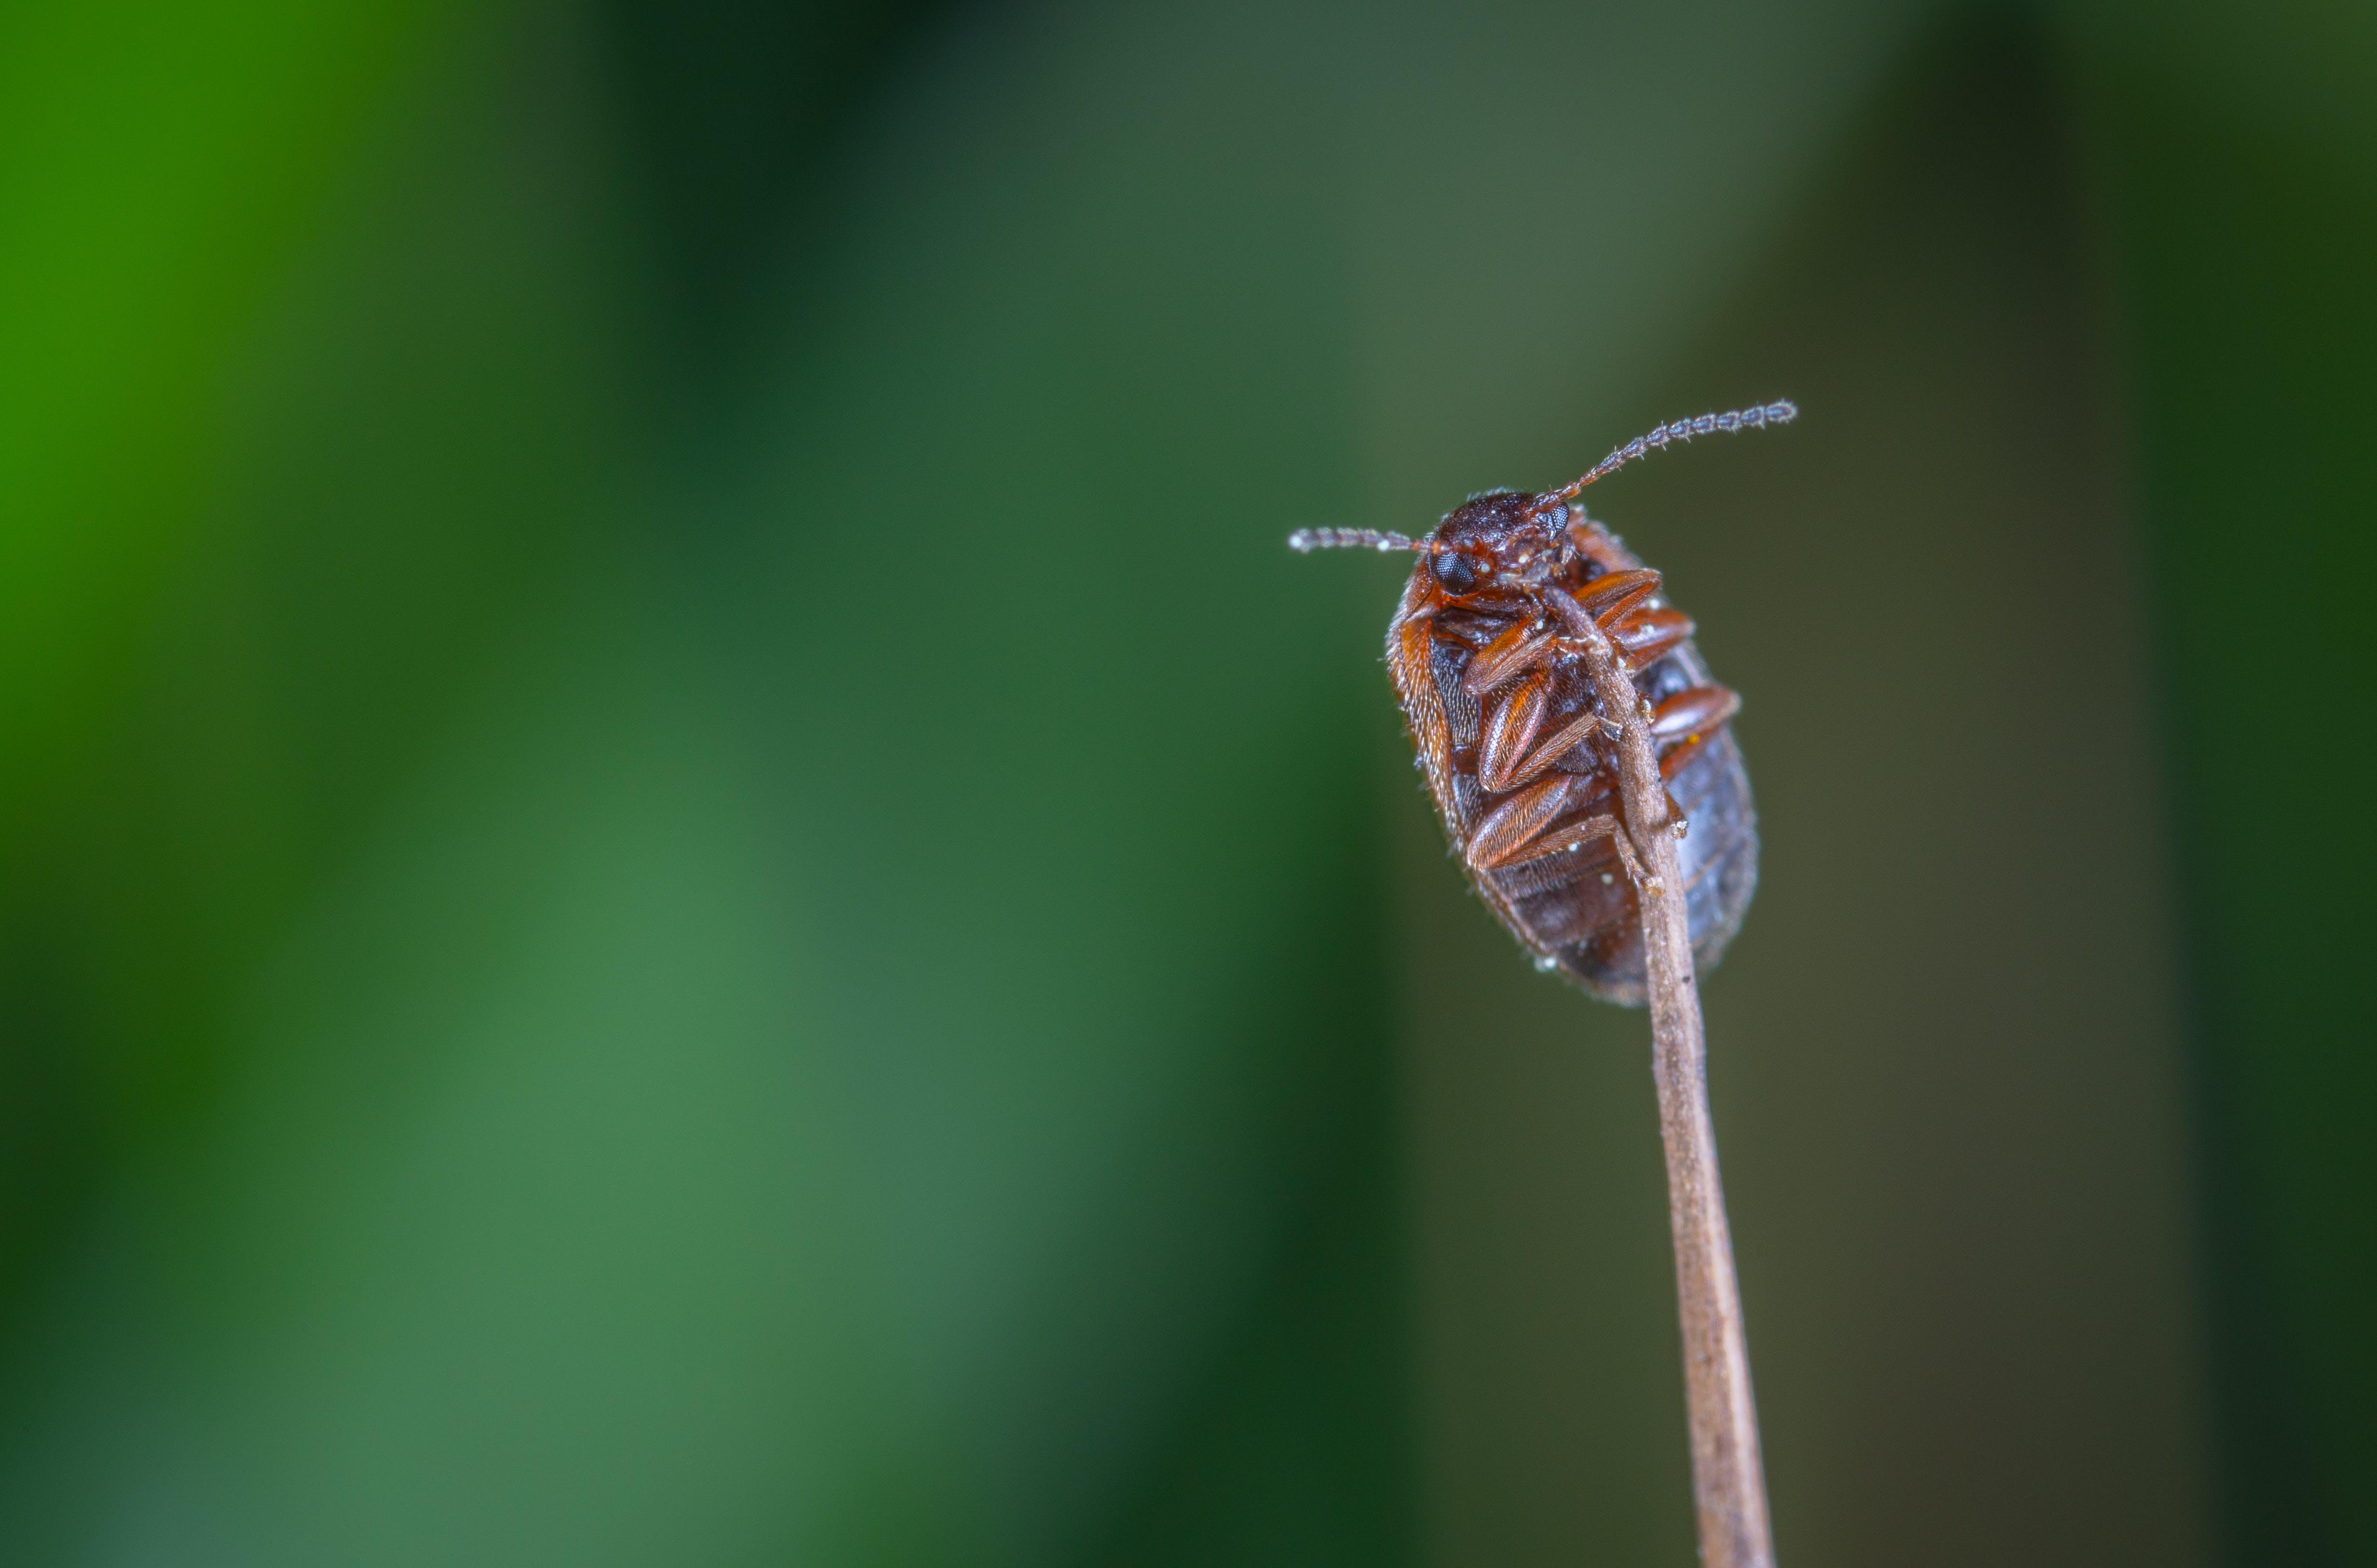 Kostenloses Stock Foto zu bug, entomologie, insekt, käfer